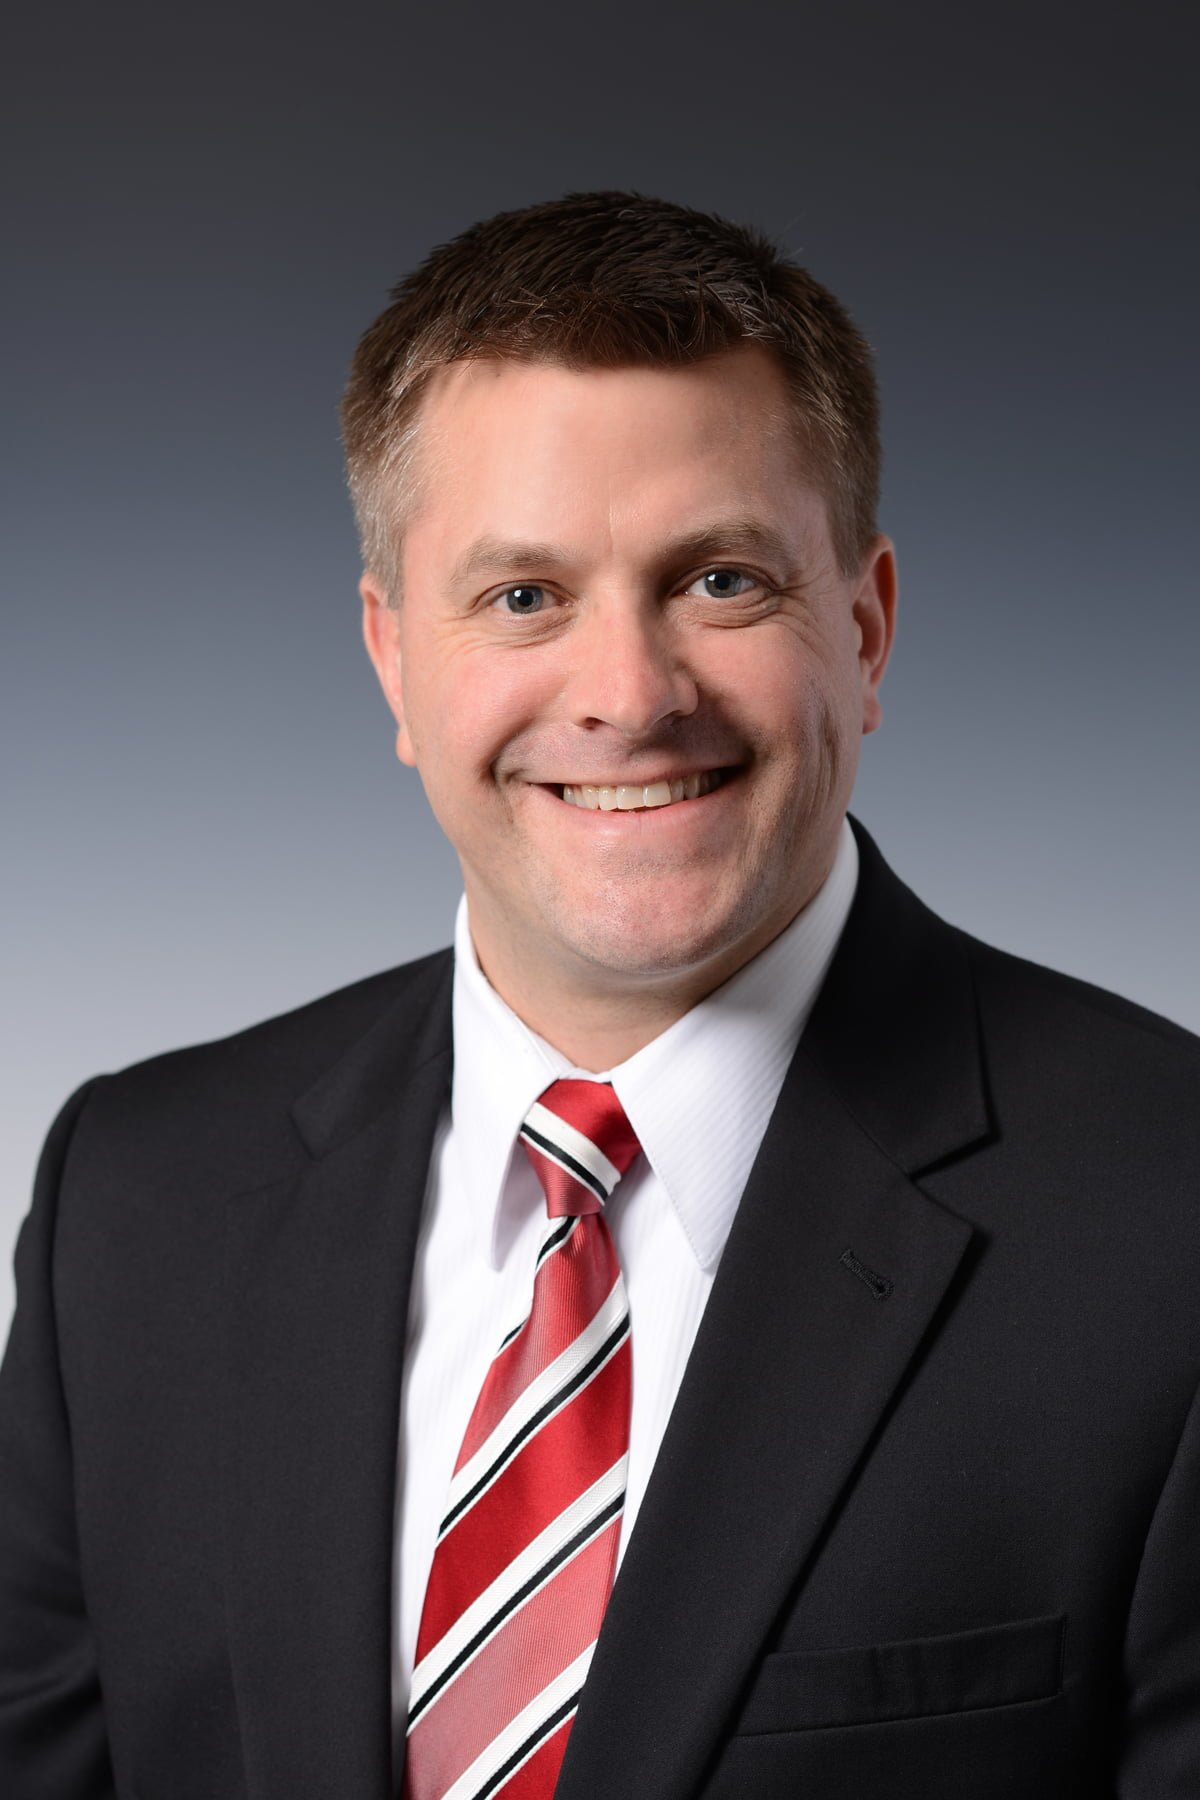 Tim Petska